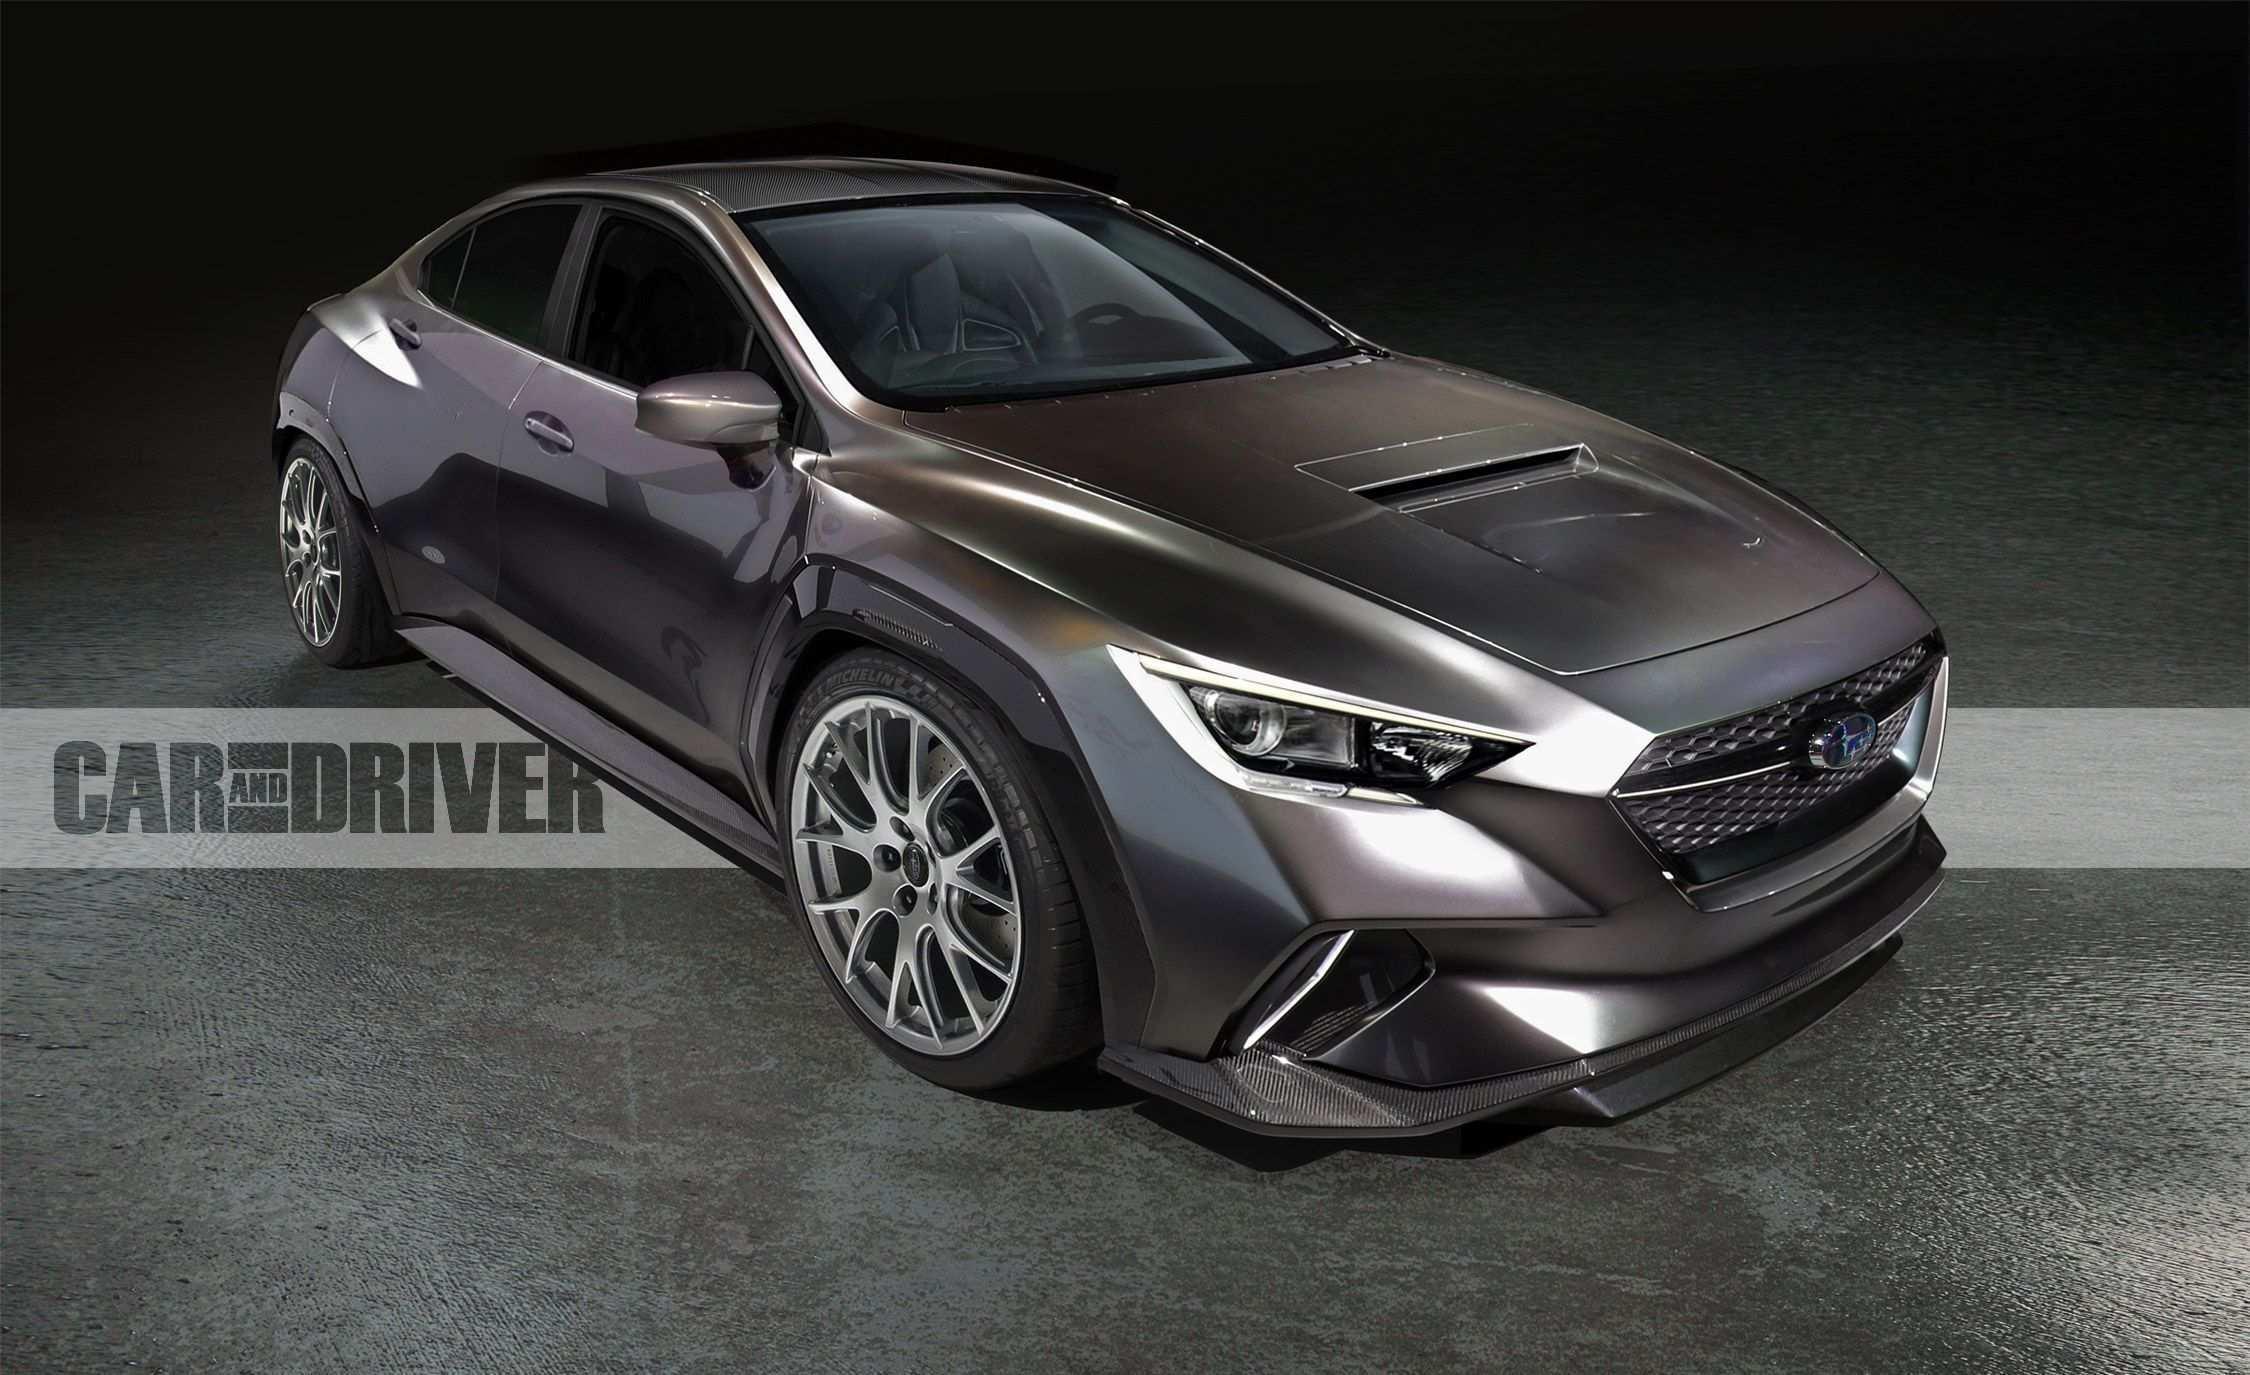 27 New 2020 Subaru Sti Release Date Ratings with 2020 Subaru Sti Release Date